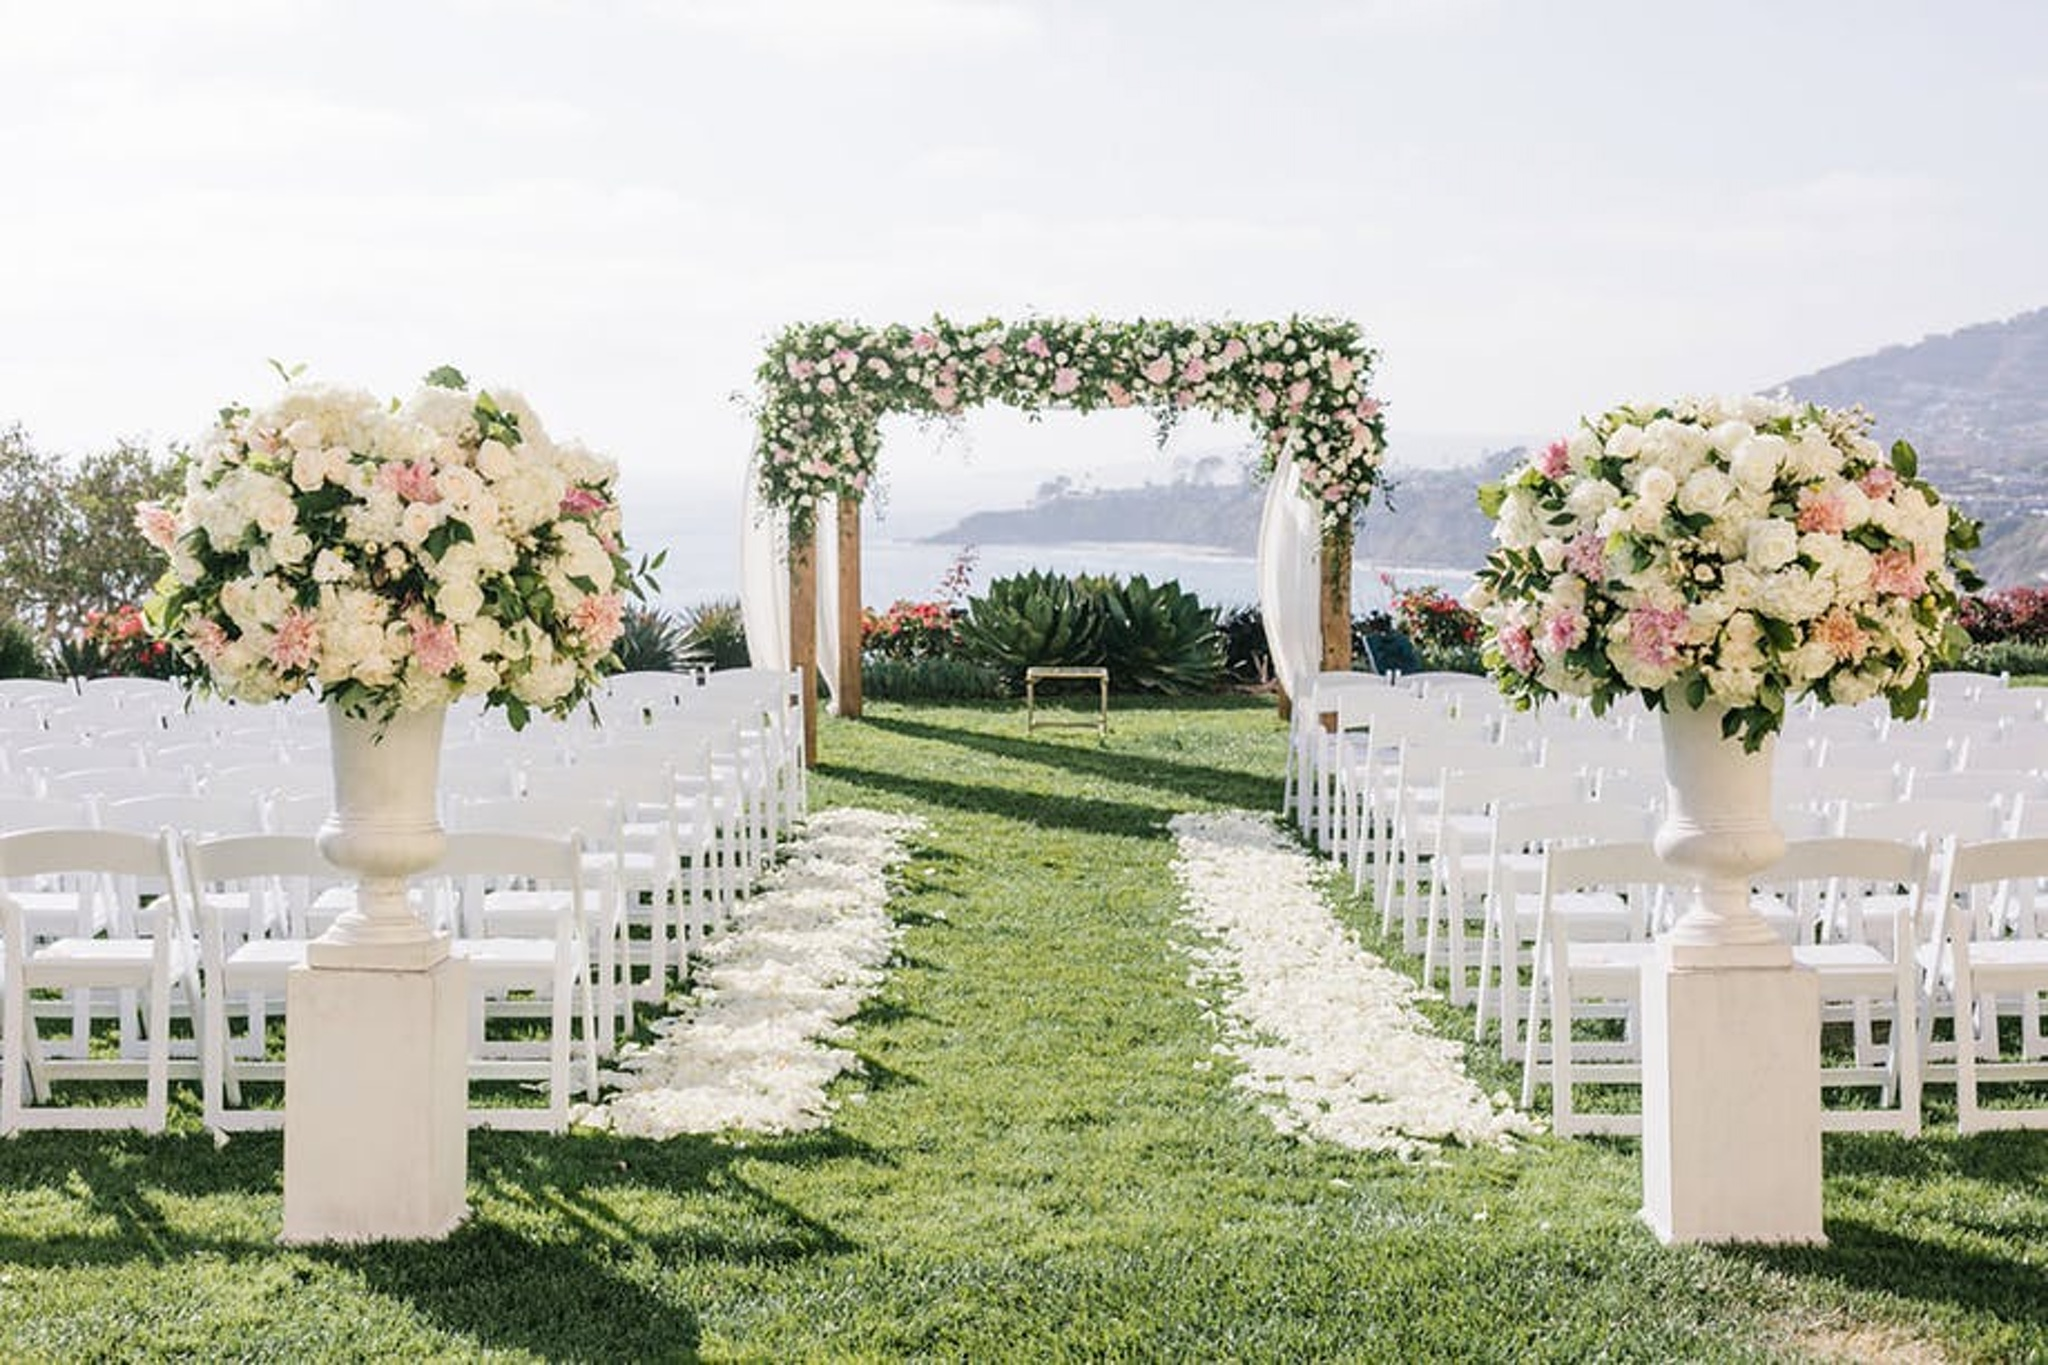 Outdoor wedding venue at The Ritz-Carlton, Laguna Niguel